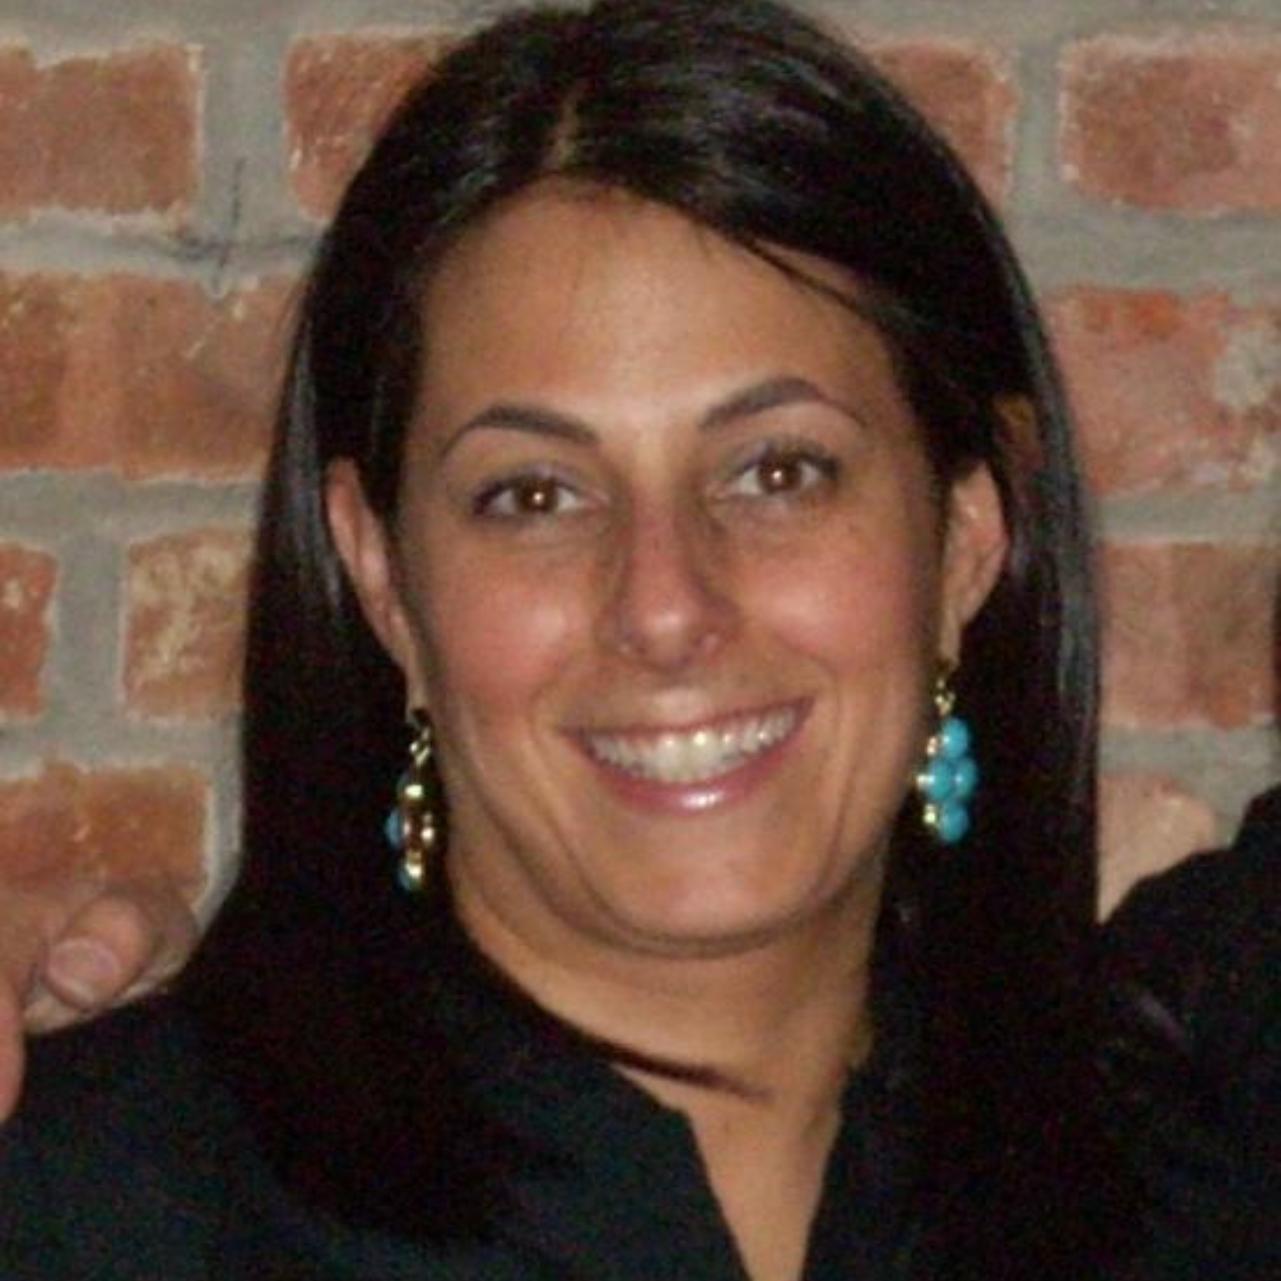 Jennifer Ruza